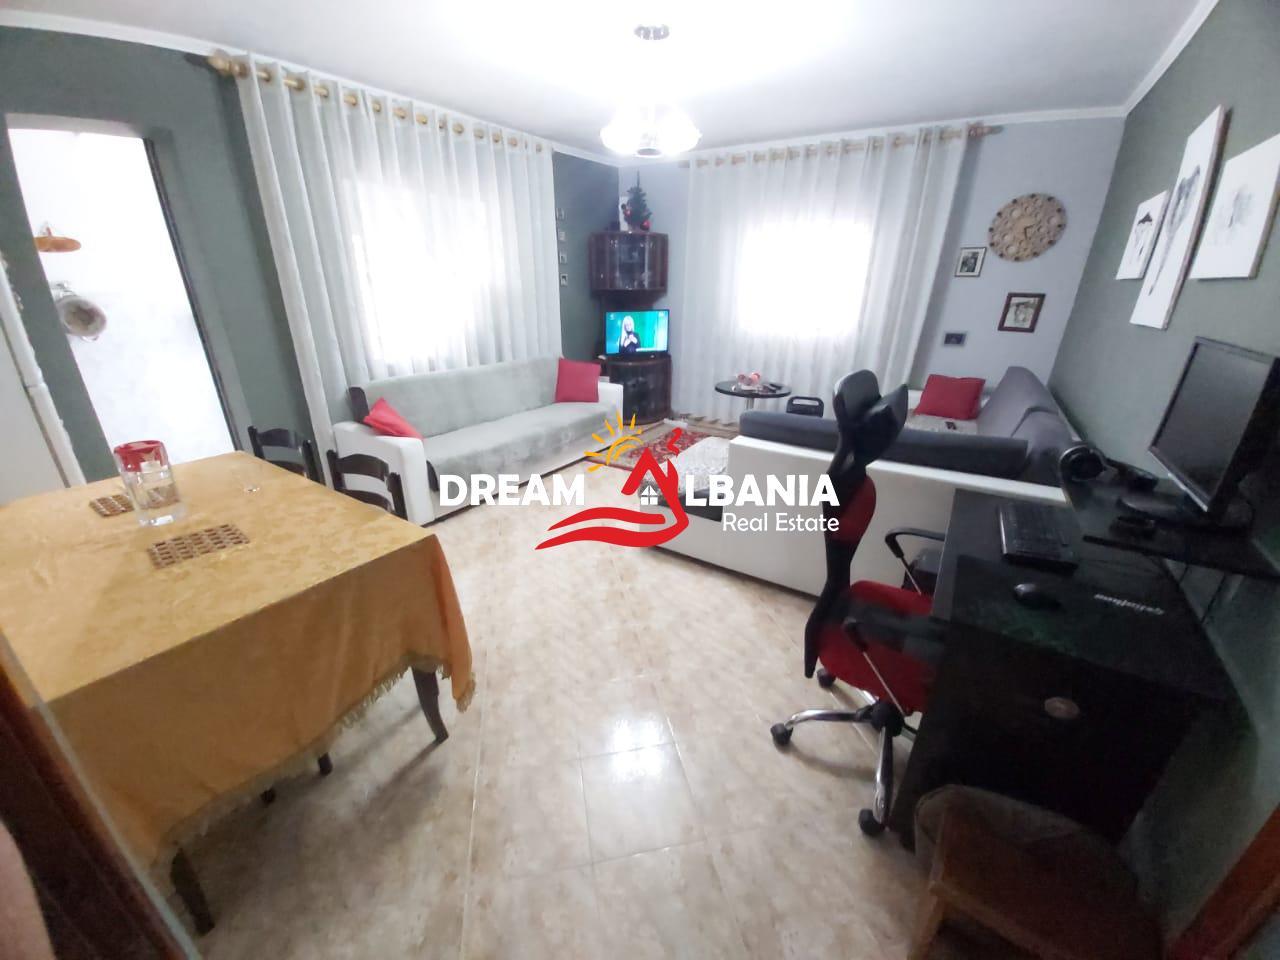 Apartamente 1+1 ne shitje ne zonen e Selvise prane gjimnazit Partizani ne Tirane (ID 4119084 )